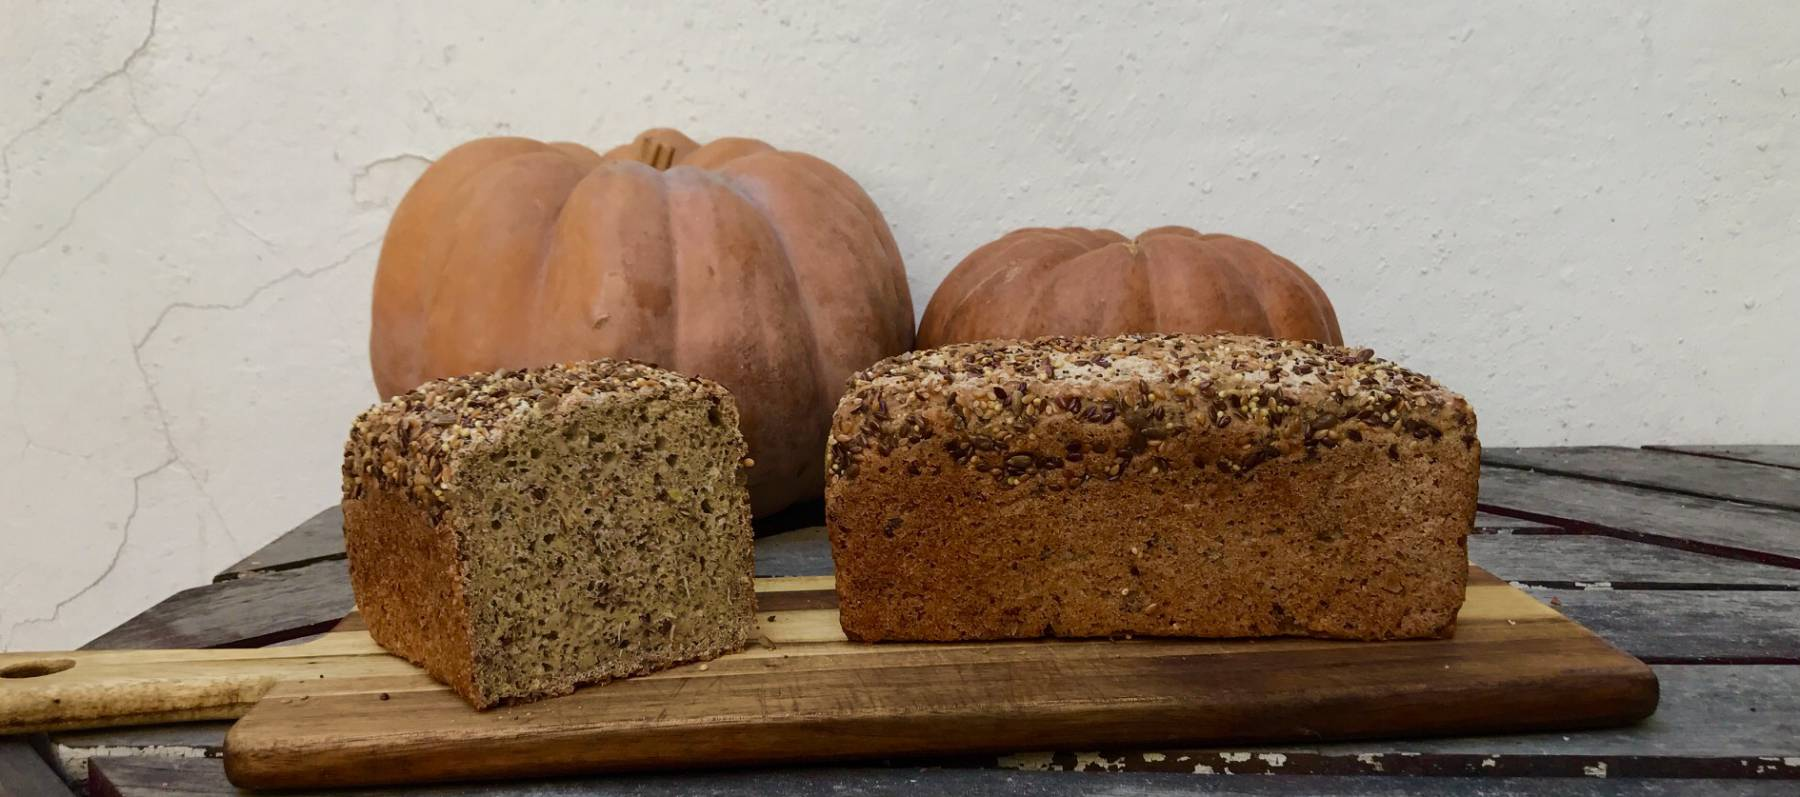 receta facil para hacer pan sin gluten